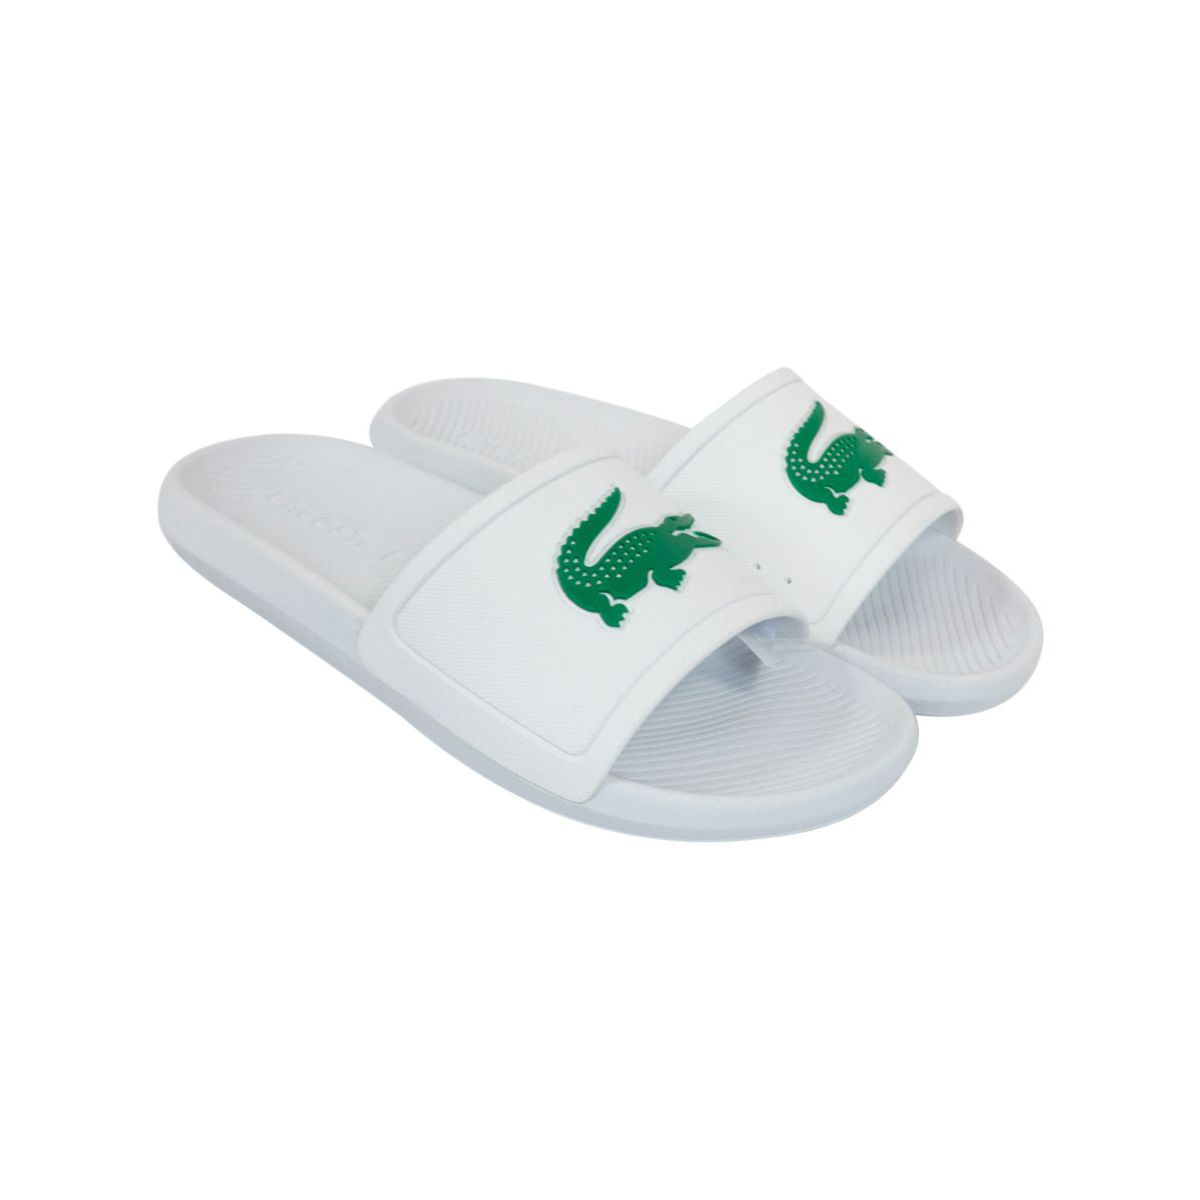 Waterproof rubber slippers White Lacoste